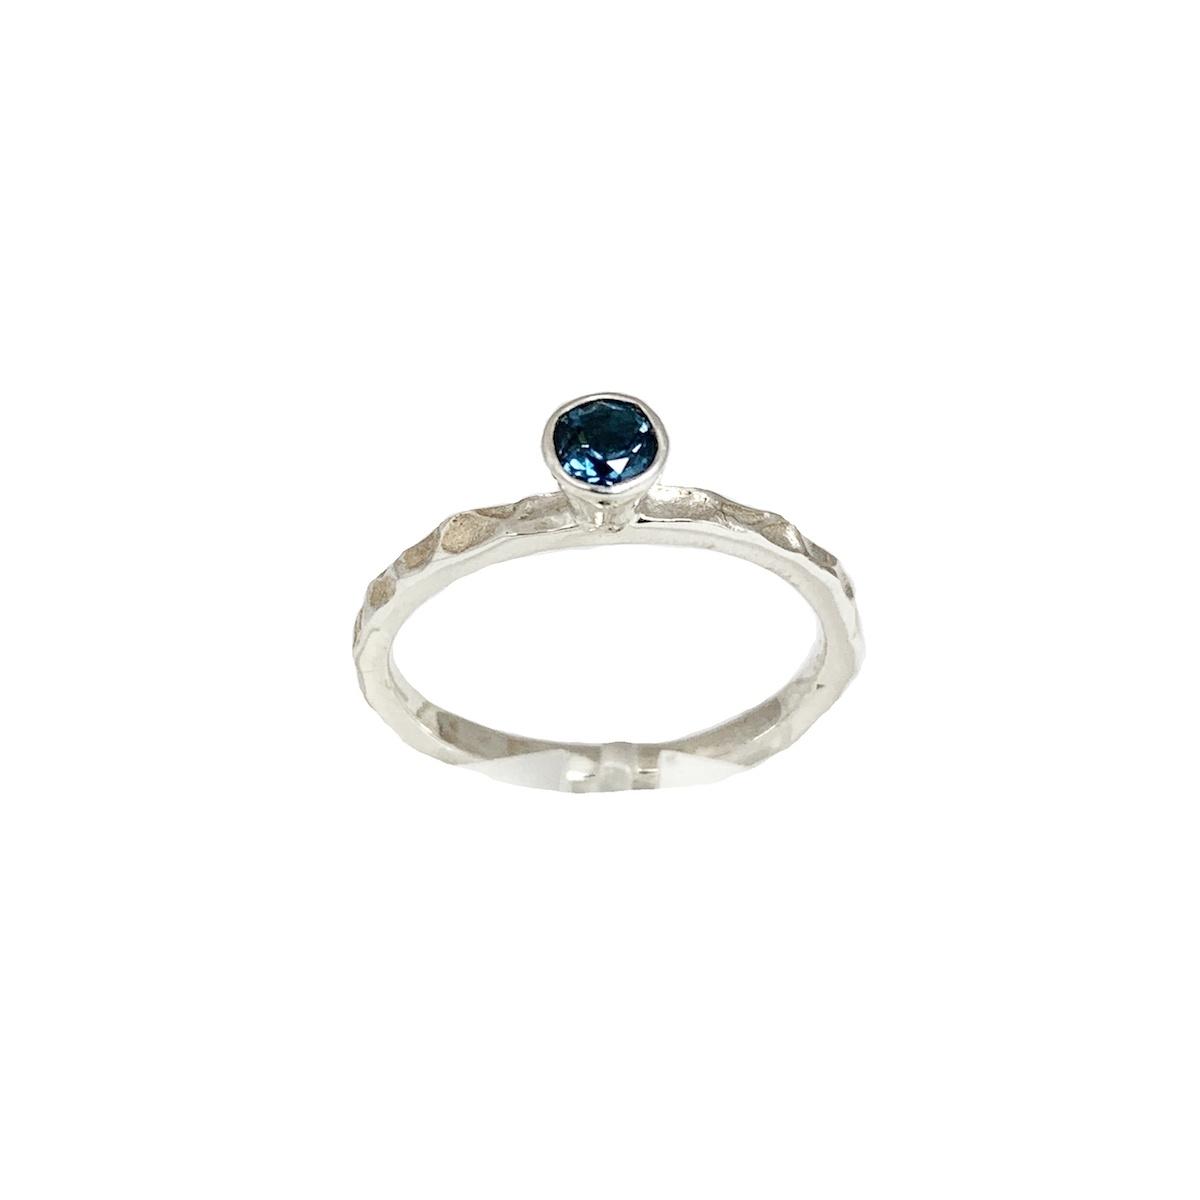 Kiliaan Jewelry Stackable rings London blue topaz